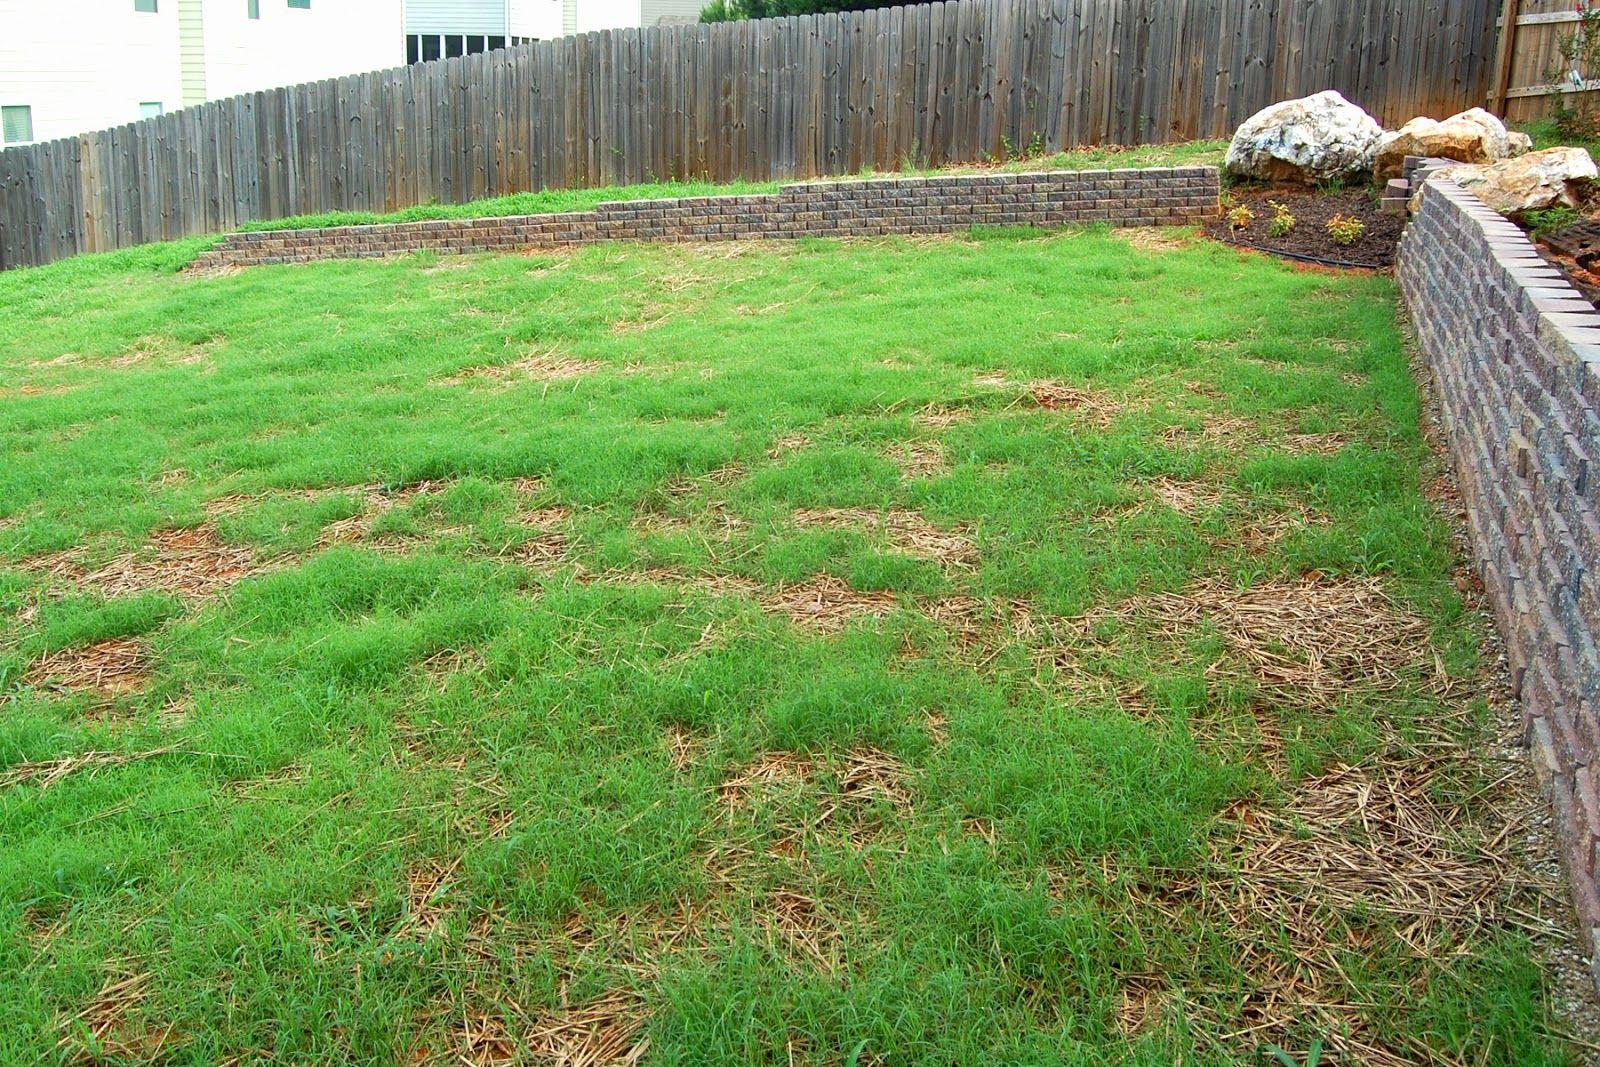 Laying Bermuda Grass Seed Retaining Wall Grading And Leveling Bermuda Grass Seed Bermuda Grass Grass Seed